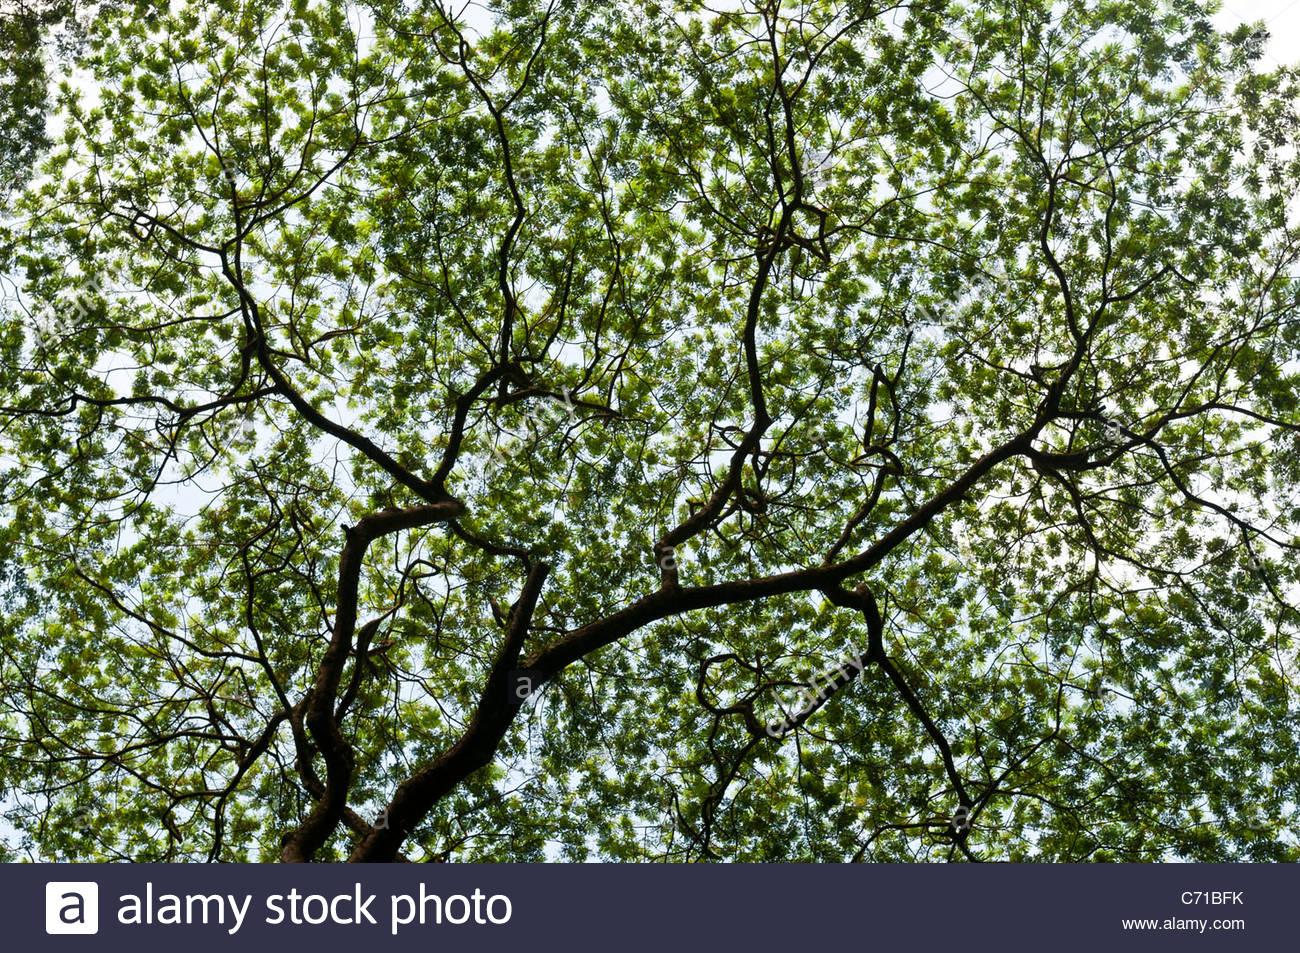 Abstract view of tree foliage, Rarotonga, Cook Islands. - Stock Image